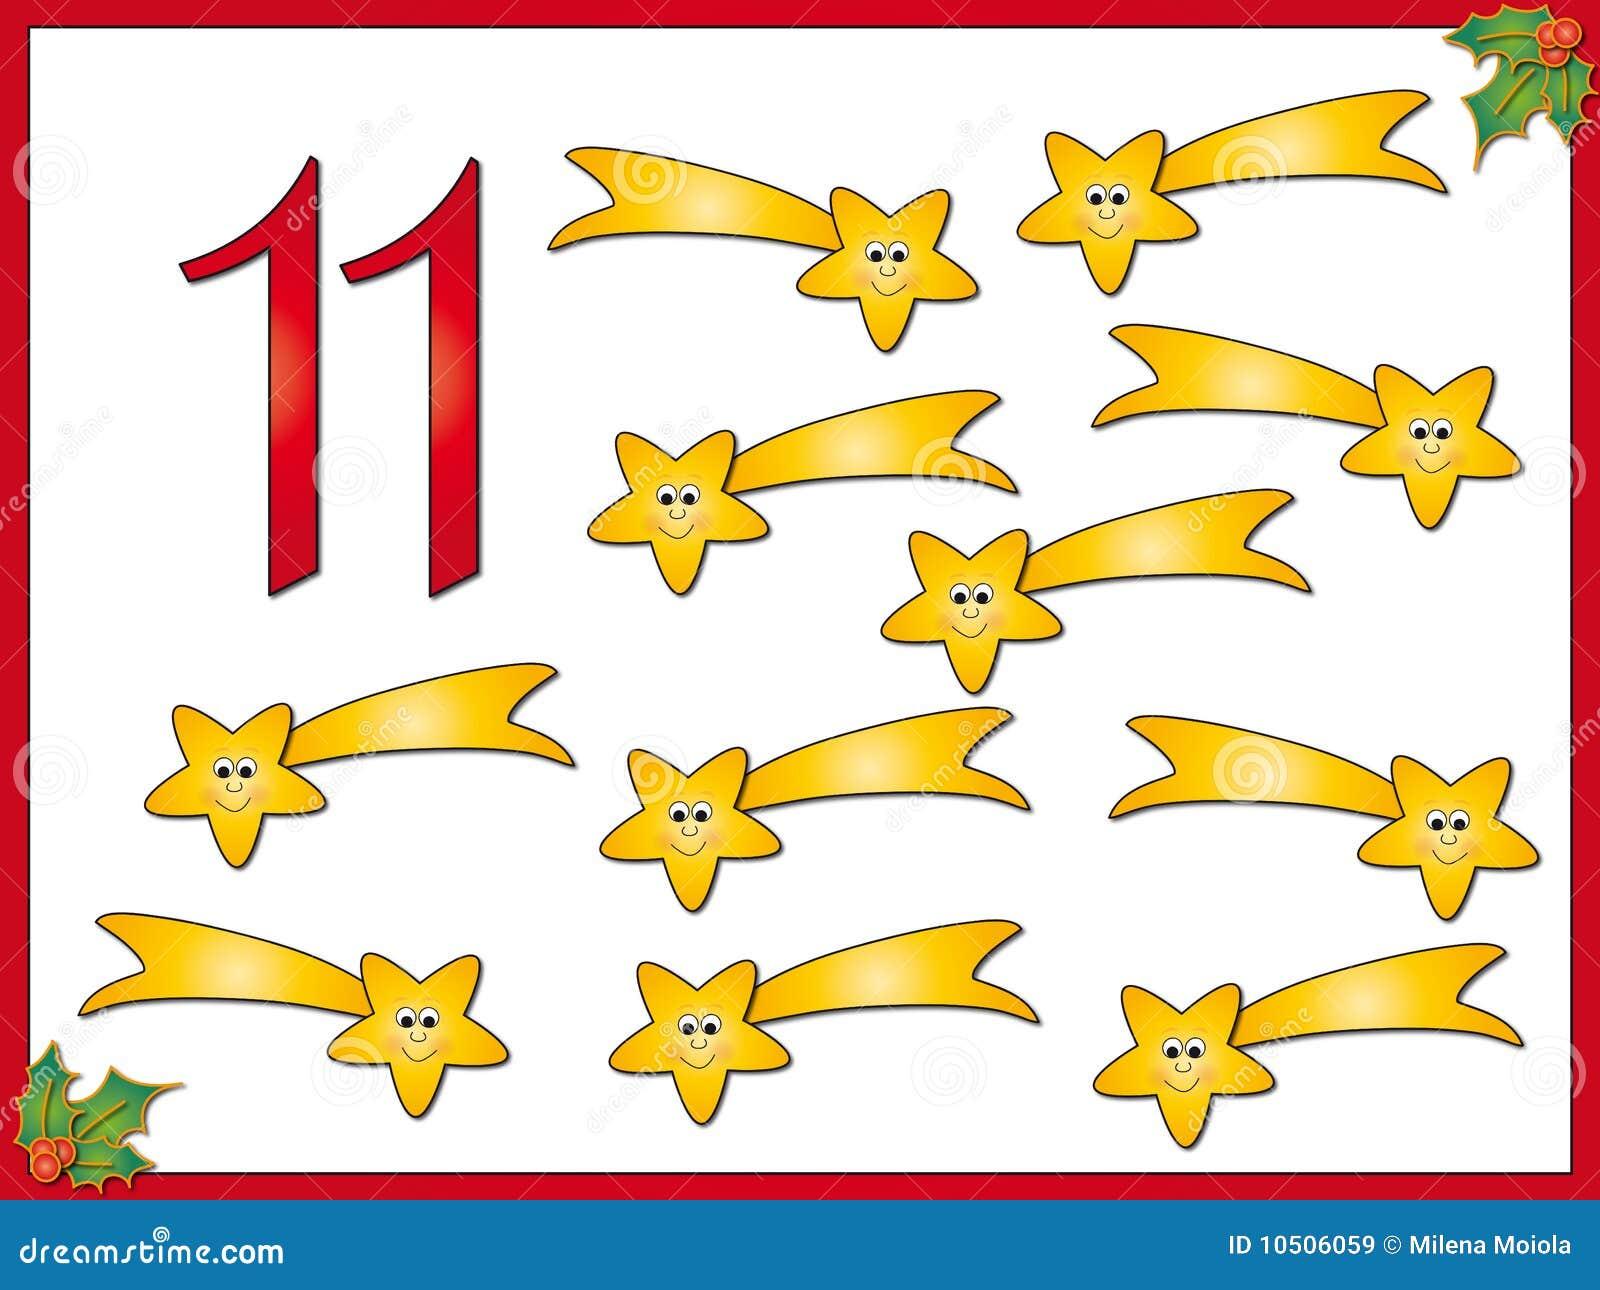 12 Days Of Christmas 11 Comet Stock Illustration Illustration Of